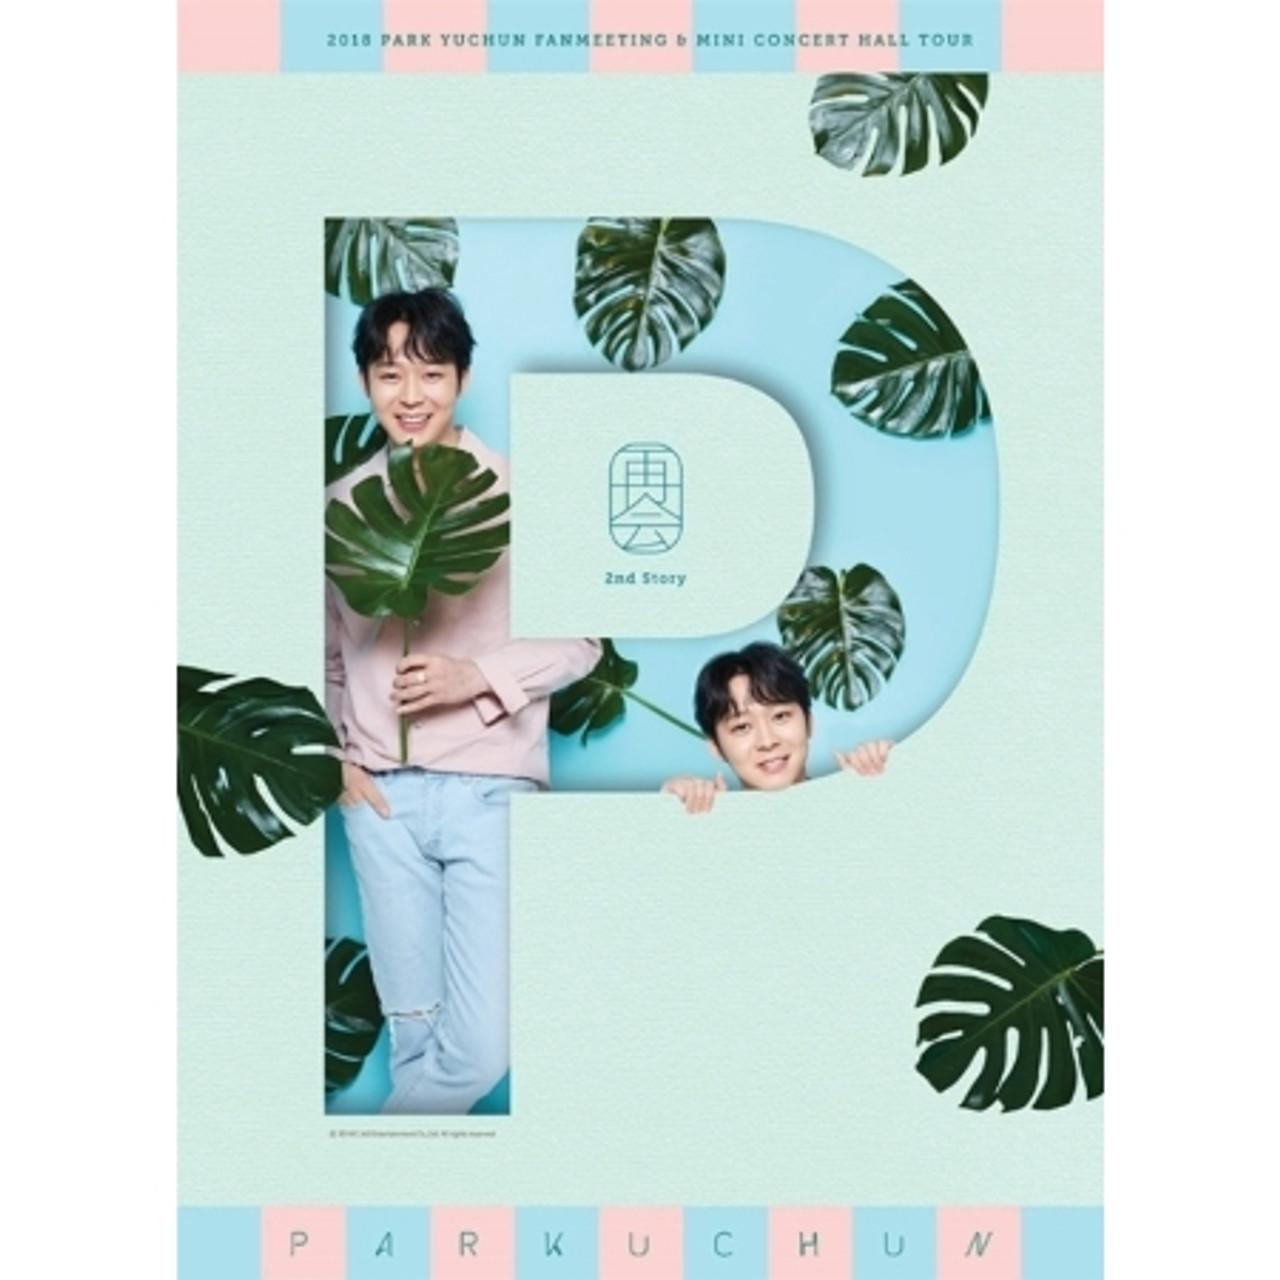 PARK YU CHUN - 2018 PARK YU CHUN FANMEETING & MINI CONCERT HALL TOUR DVD